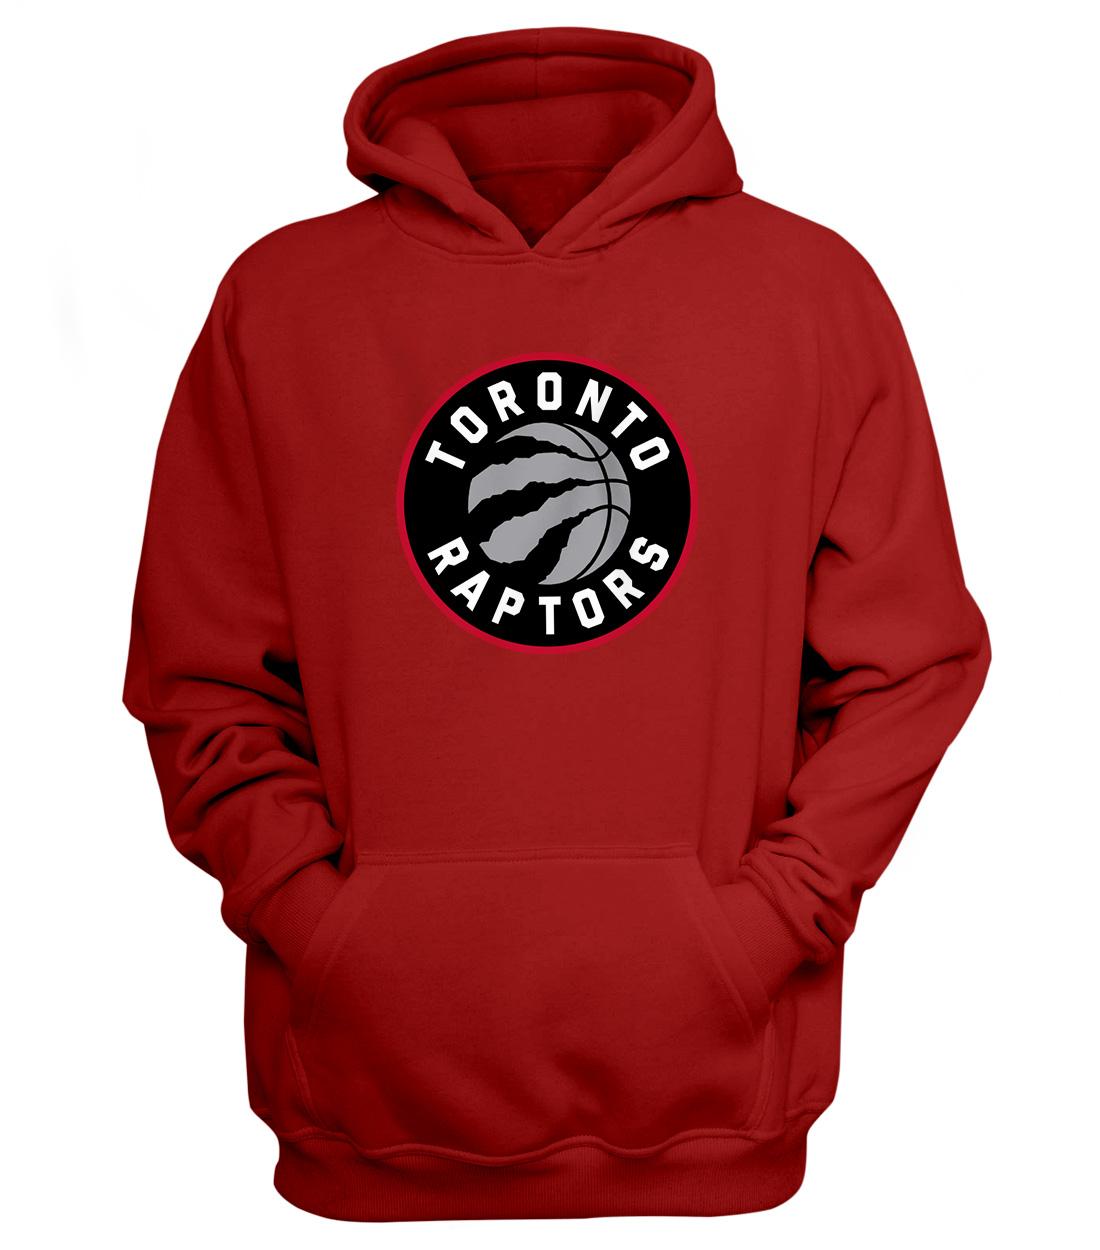 Toronto Raptors Hoodie (HD-RED-NP-197-NBA-TOR-LOGO)